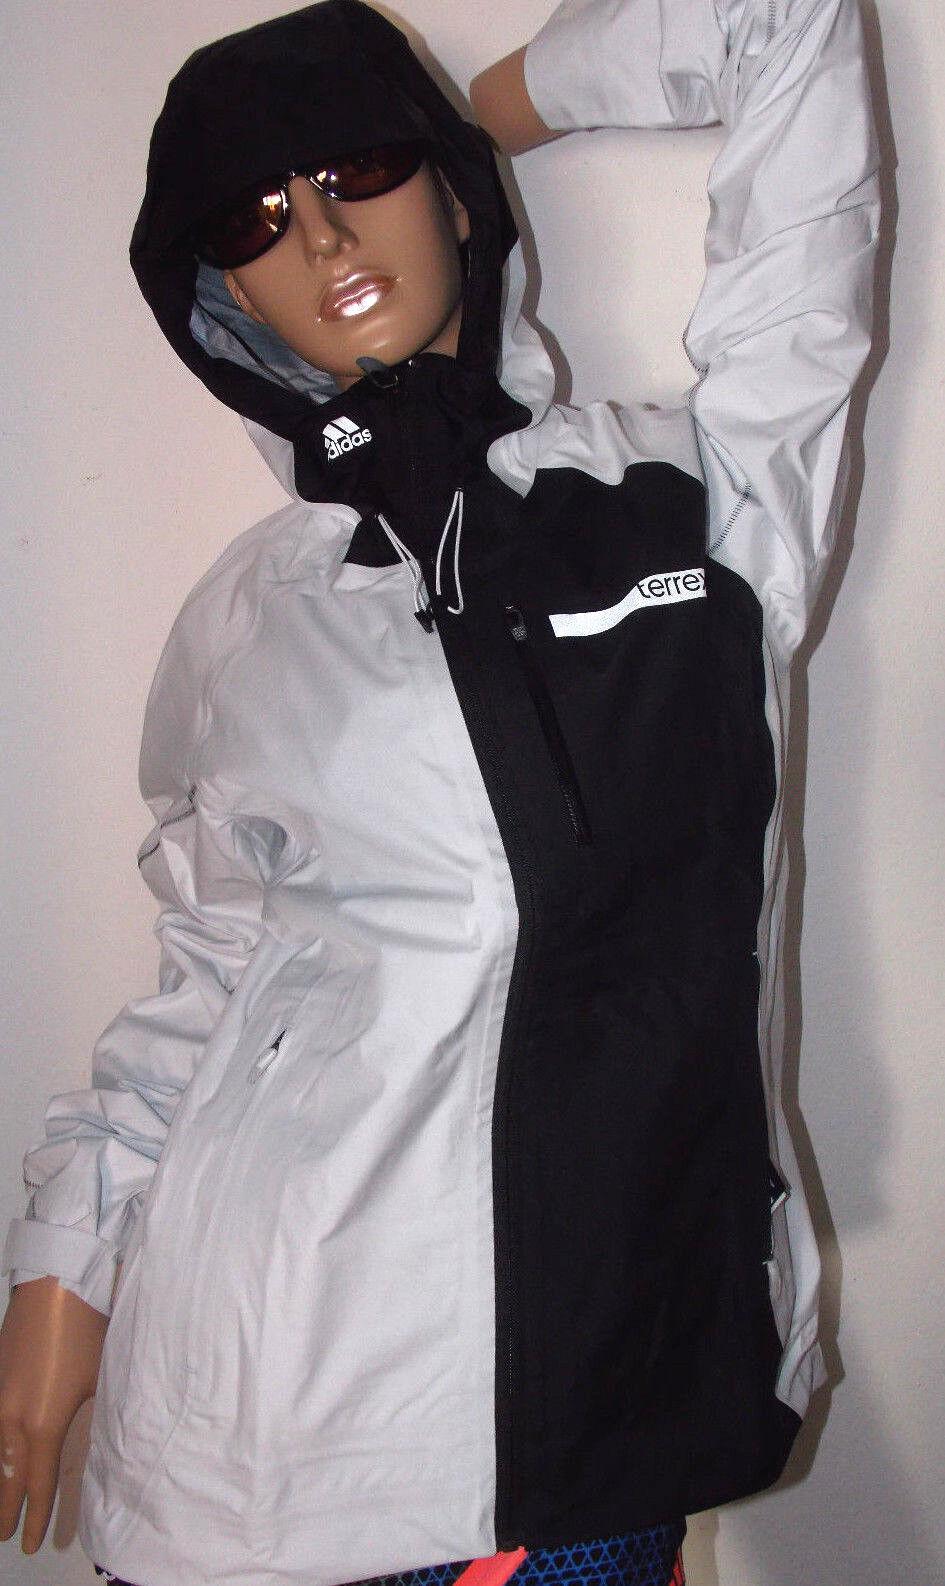 Adidas Terrex Gore-Tex mujeres Wanderjacke  w TX GTX acts 3  talla 38 blancoo negro